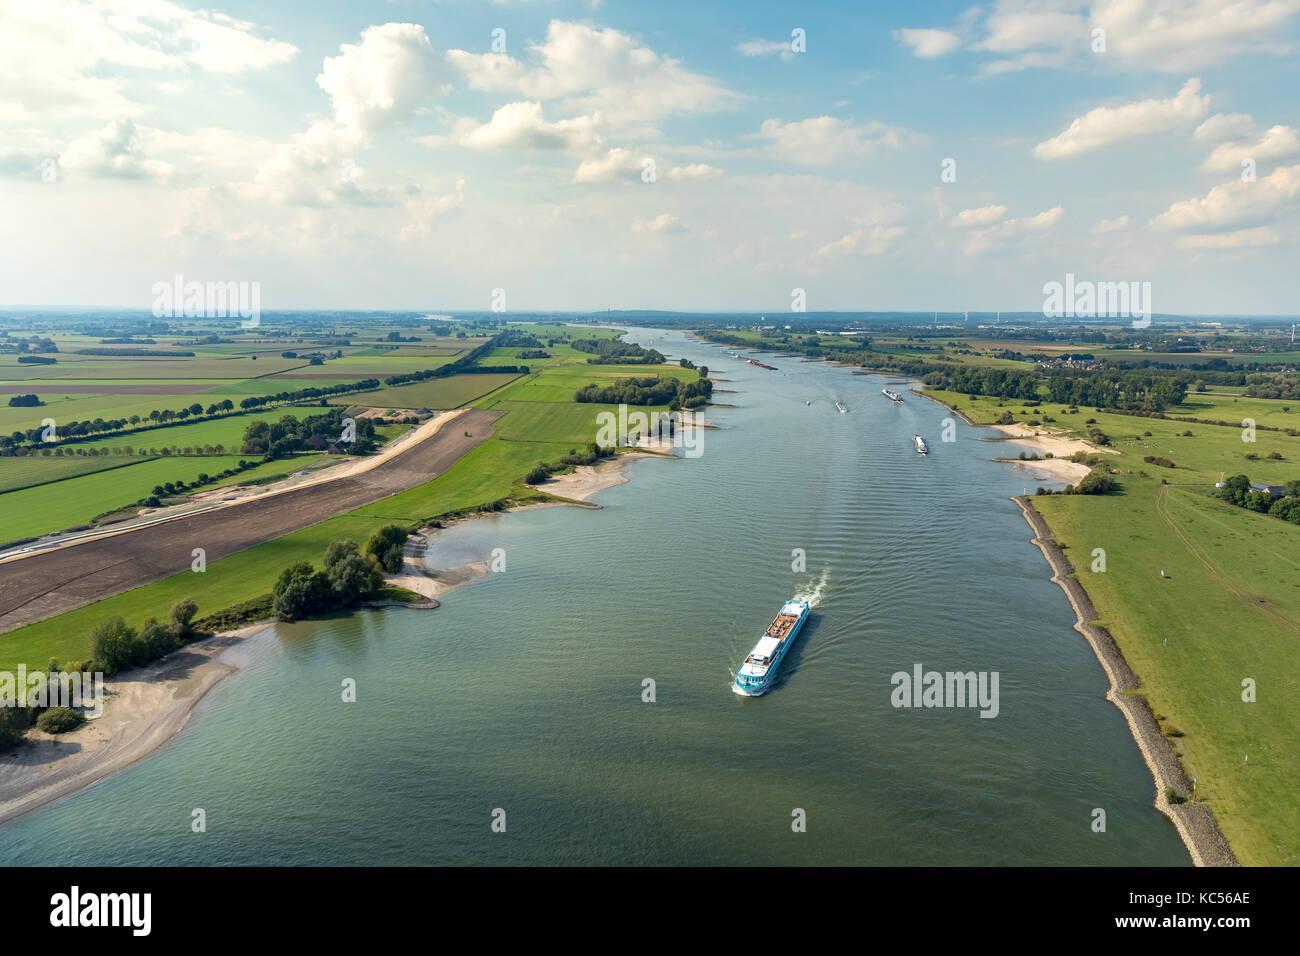 Rhine near Emmerich with cargo ships, inland navigation, Rhine landscape, Emmerich, Lower Rhine, North Rhine-Westphalia, Stock Photo